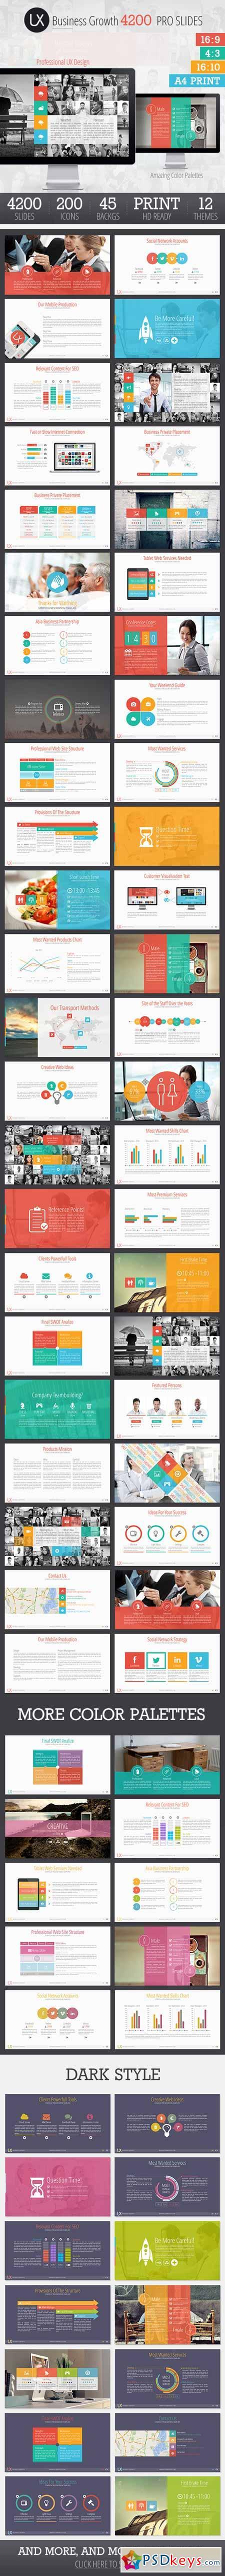 ux design presentation template 7505150 » free download photoshop, Presentation templates